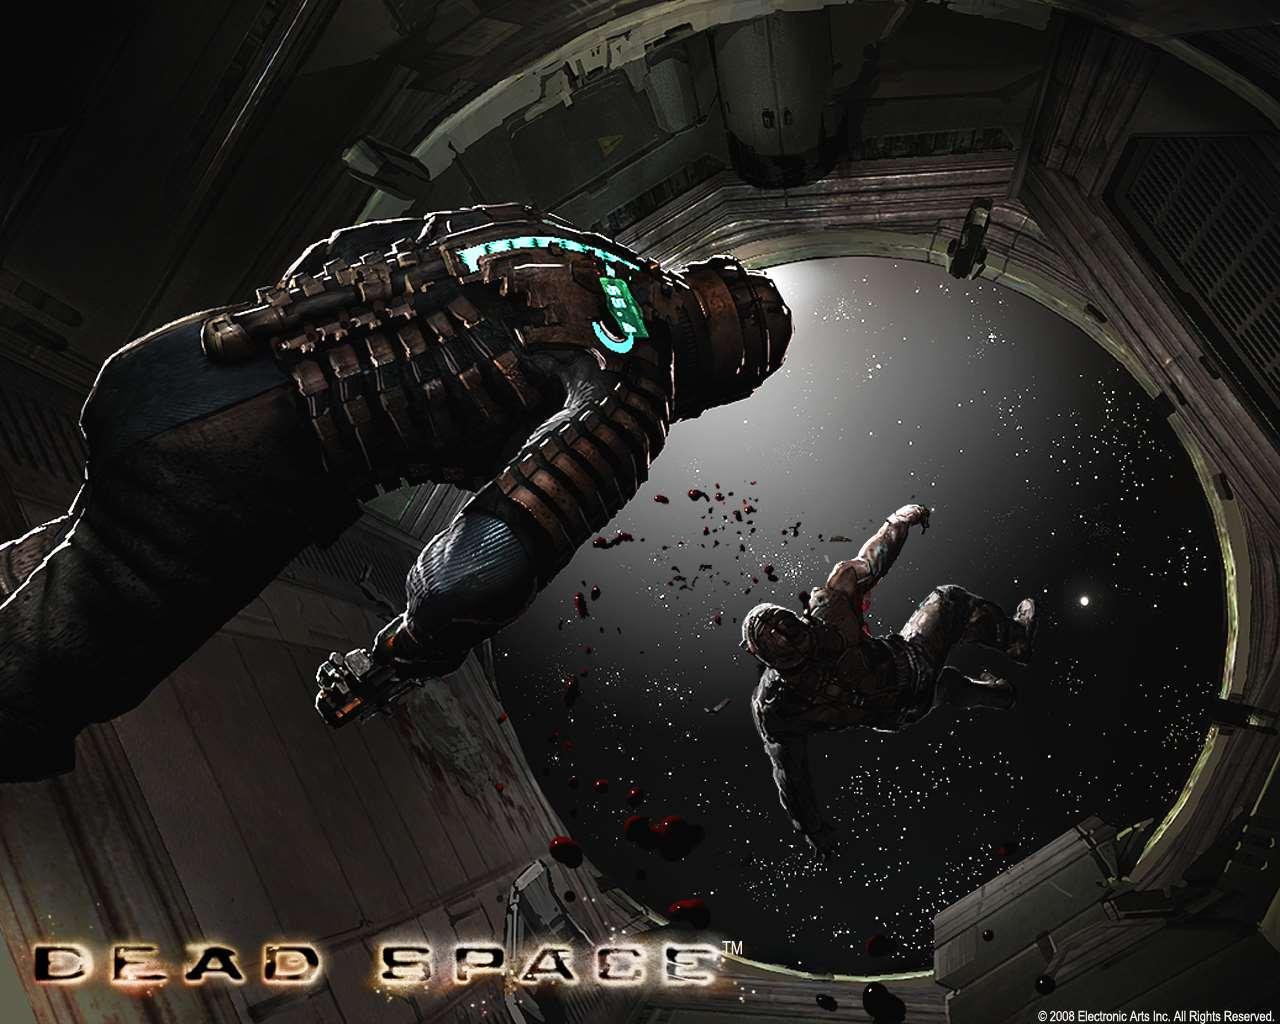 Official Dead Space Wallpaper